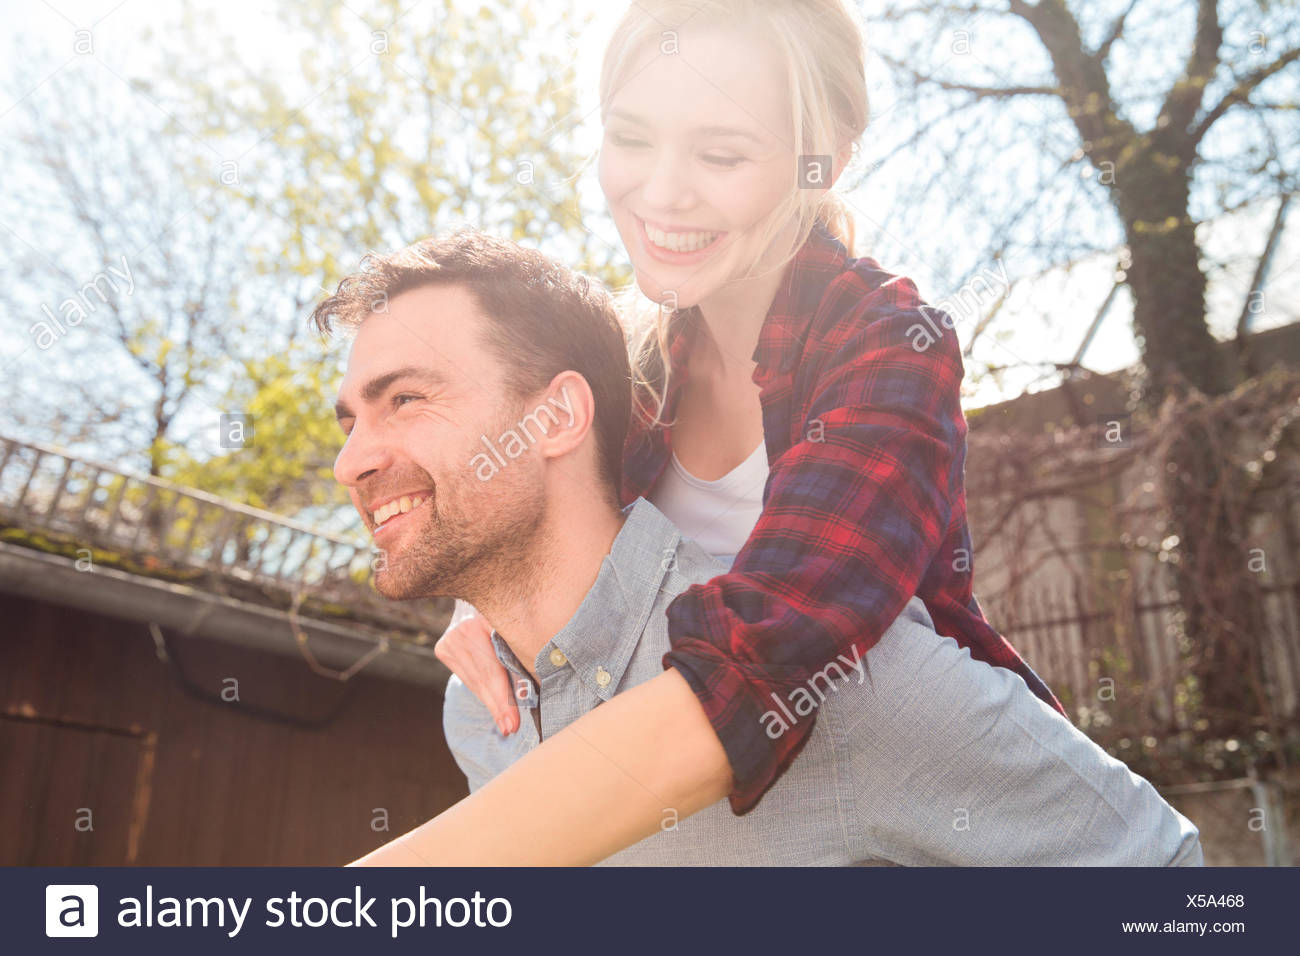 Uomo Donna dando piggyback sorridente Immagini Stock